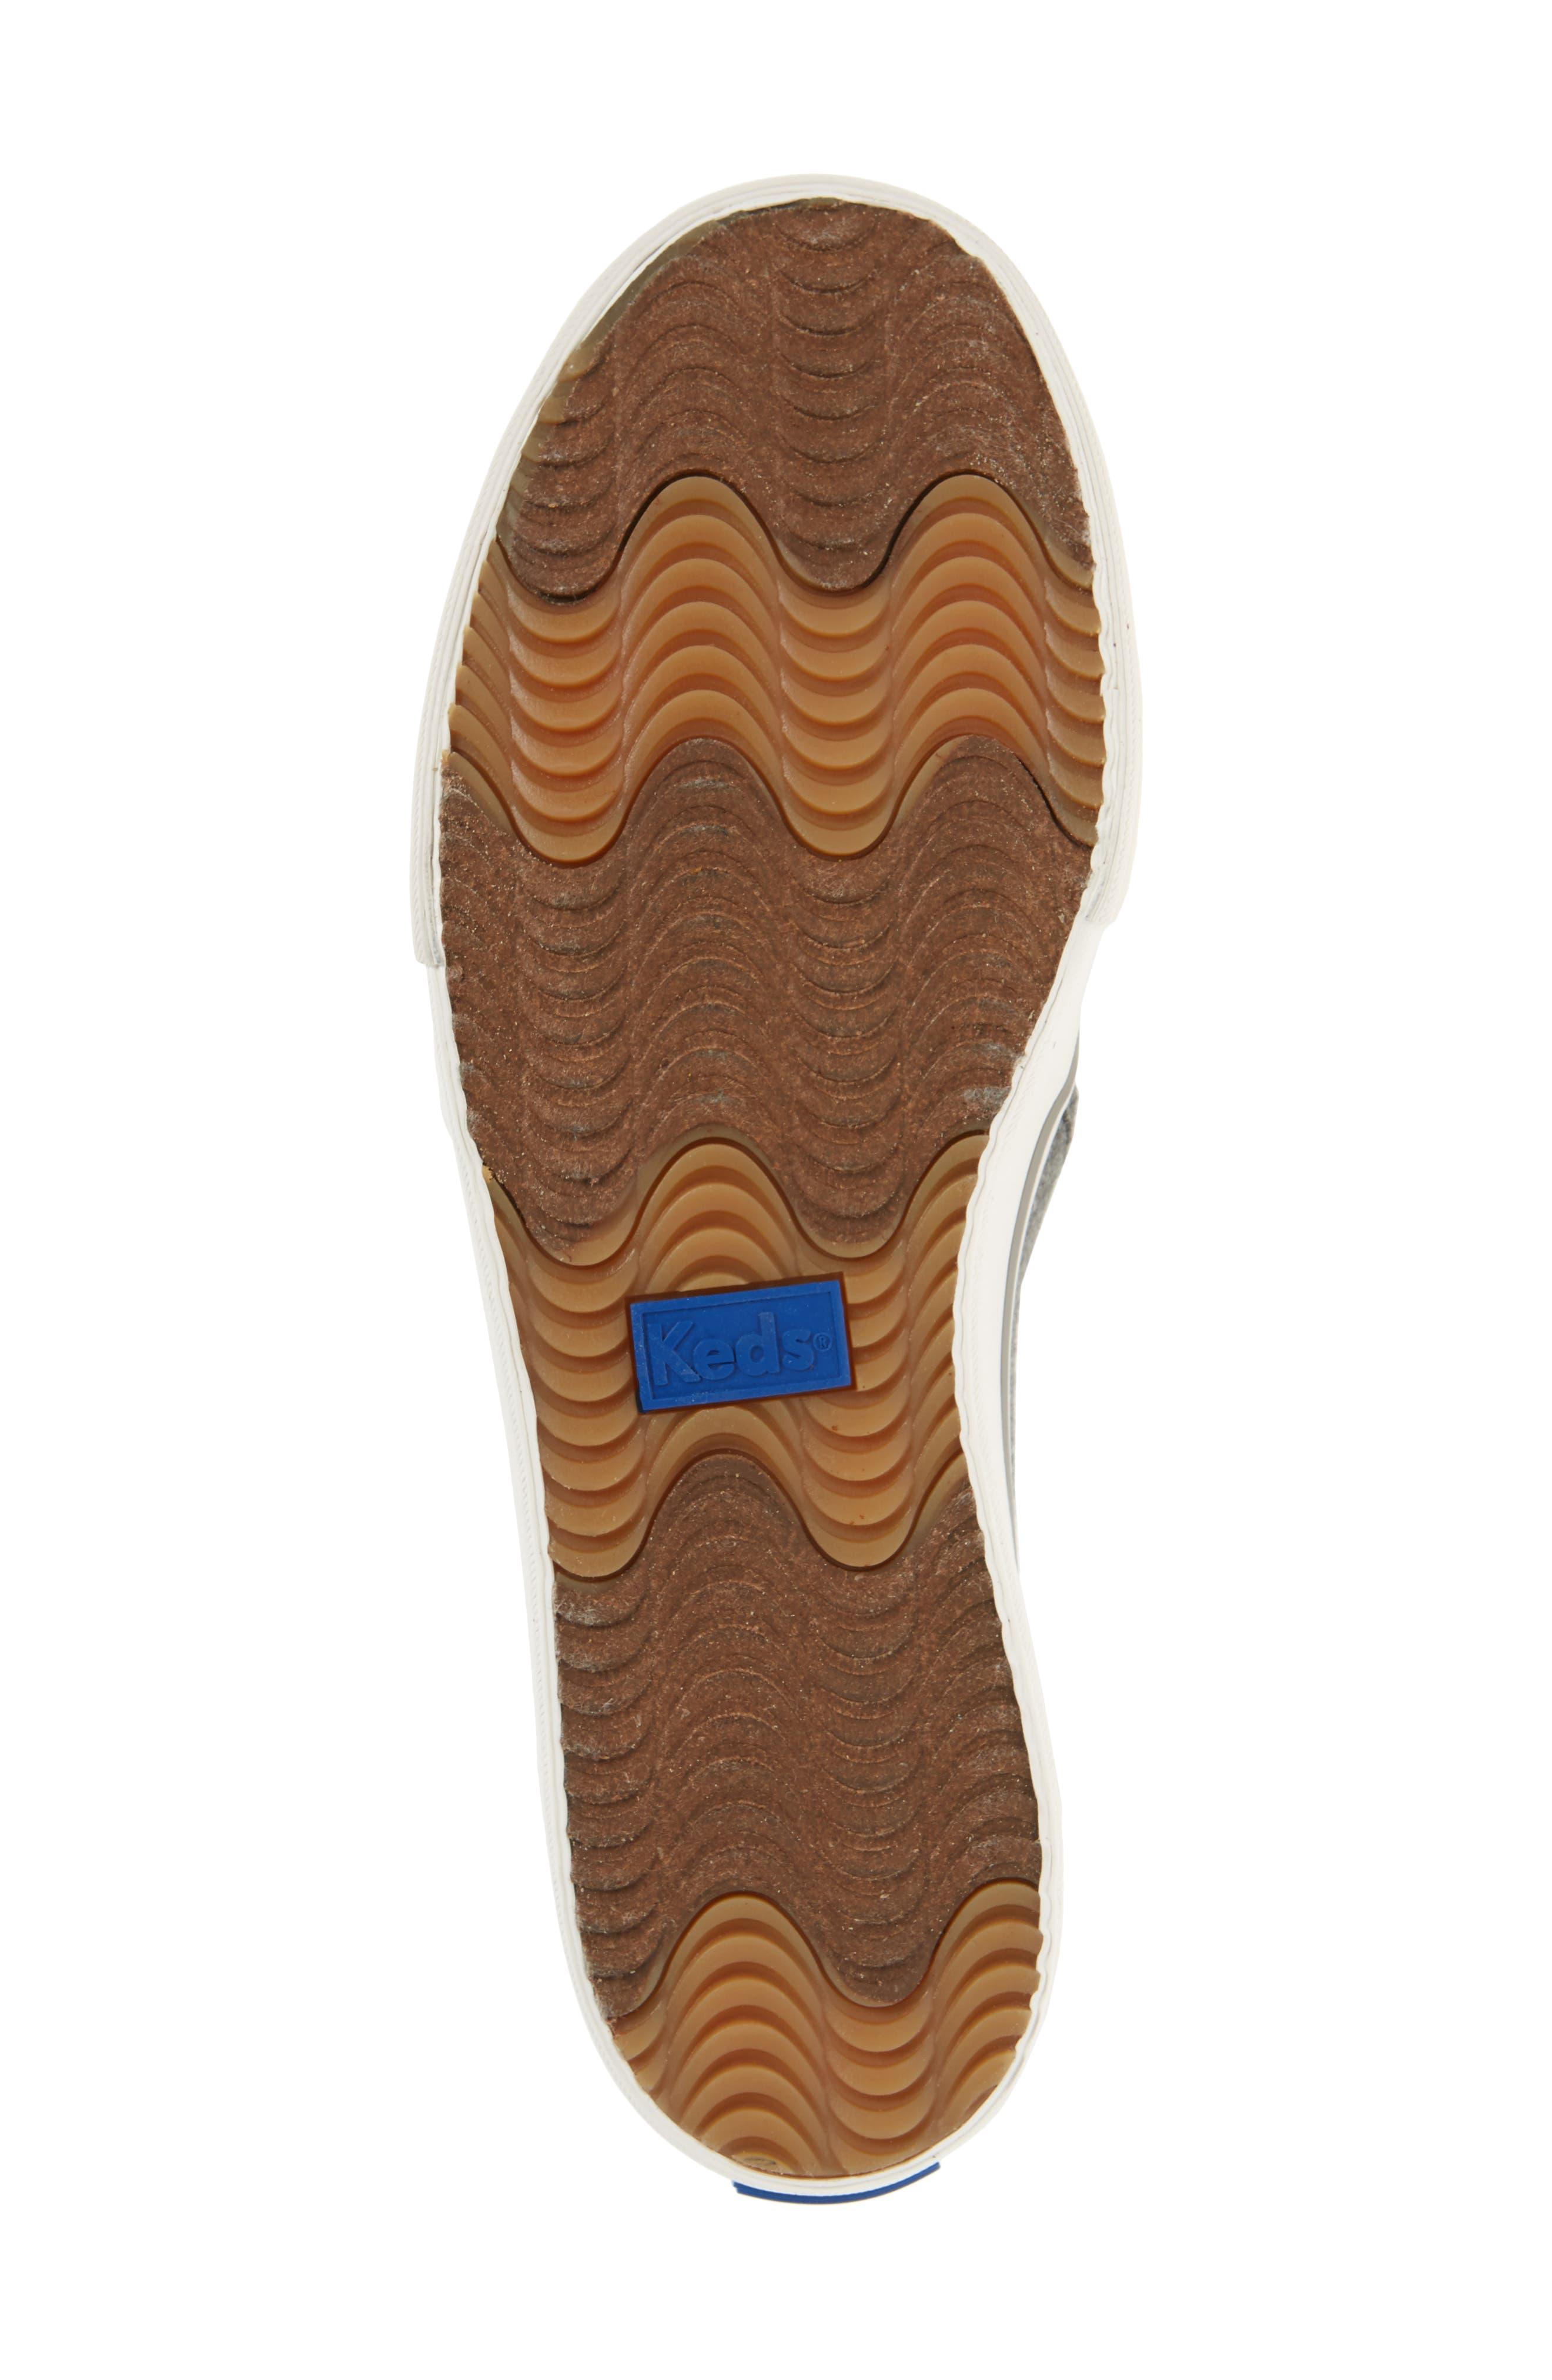 Double Decker Perforated Slip-On Sneaker,                             Alternate thumbnail 6, color,